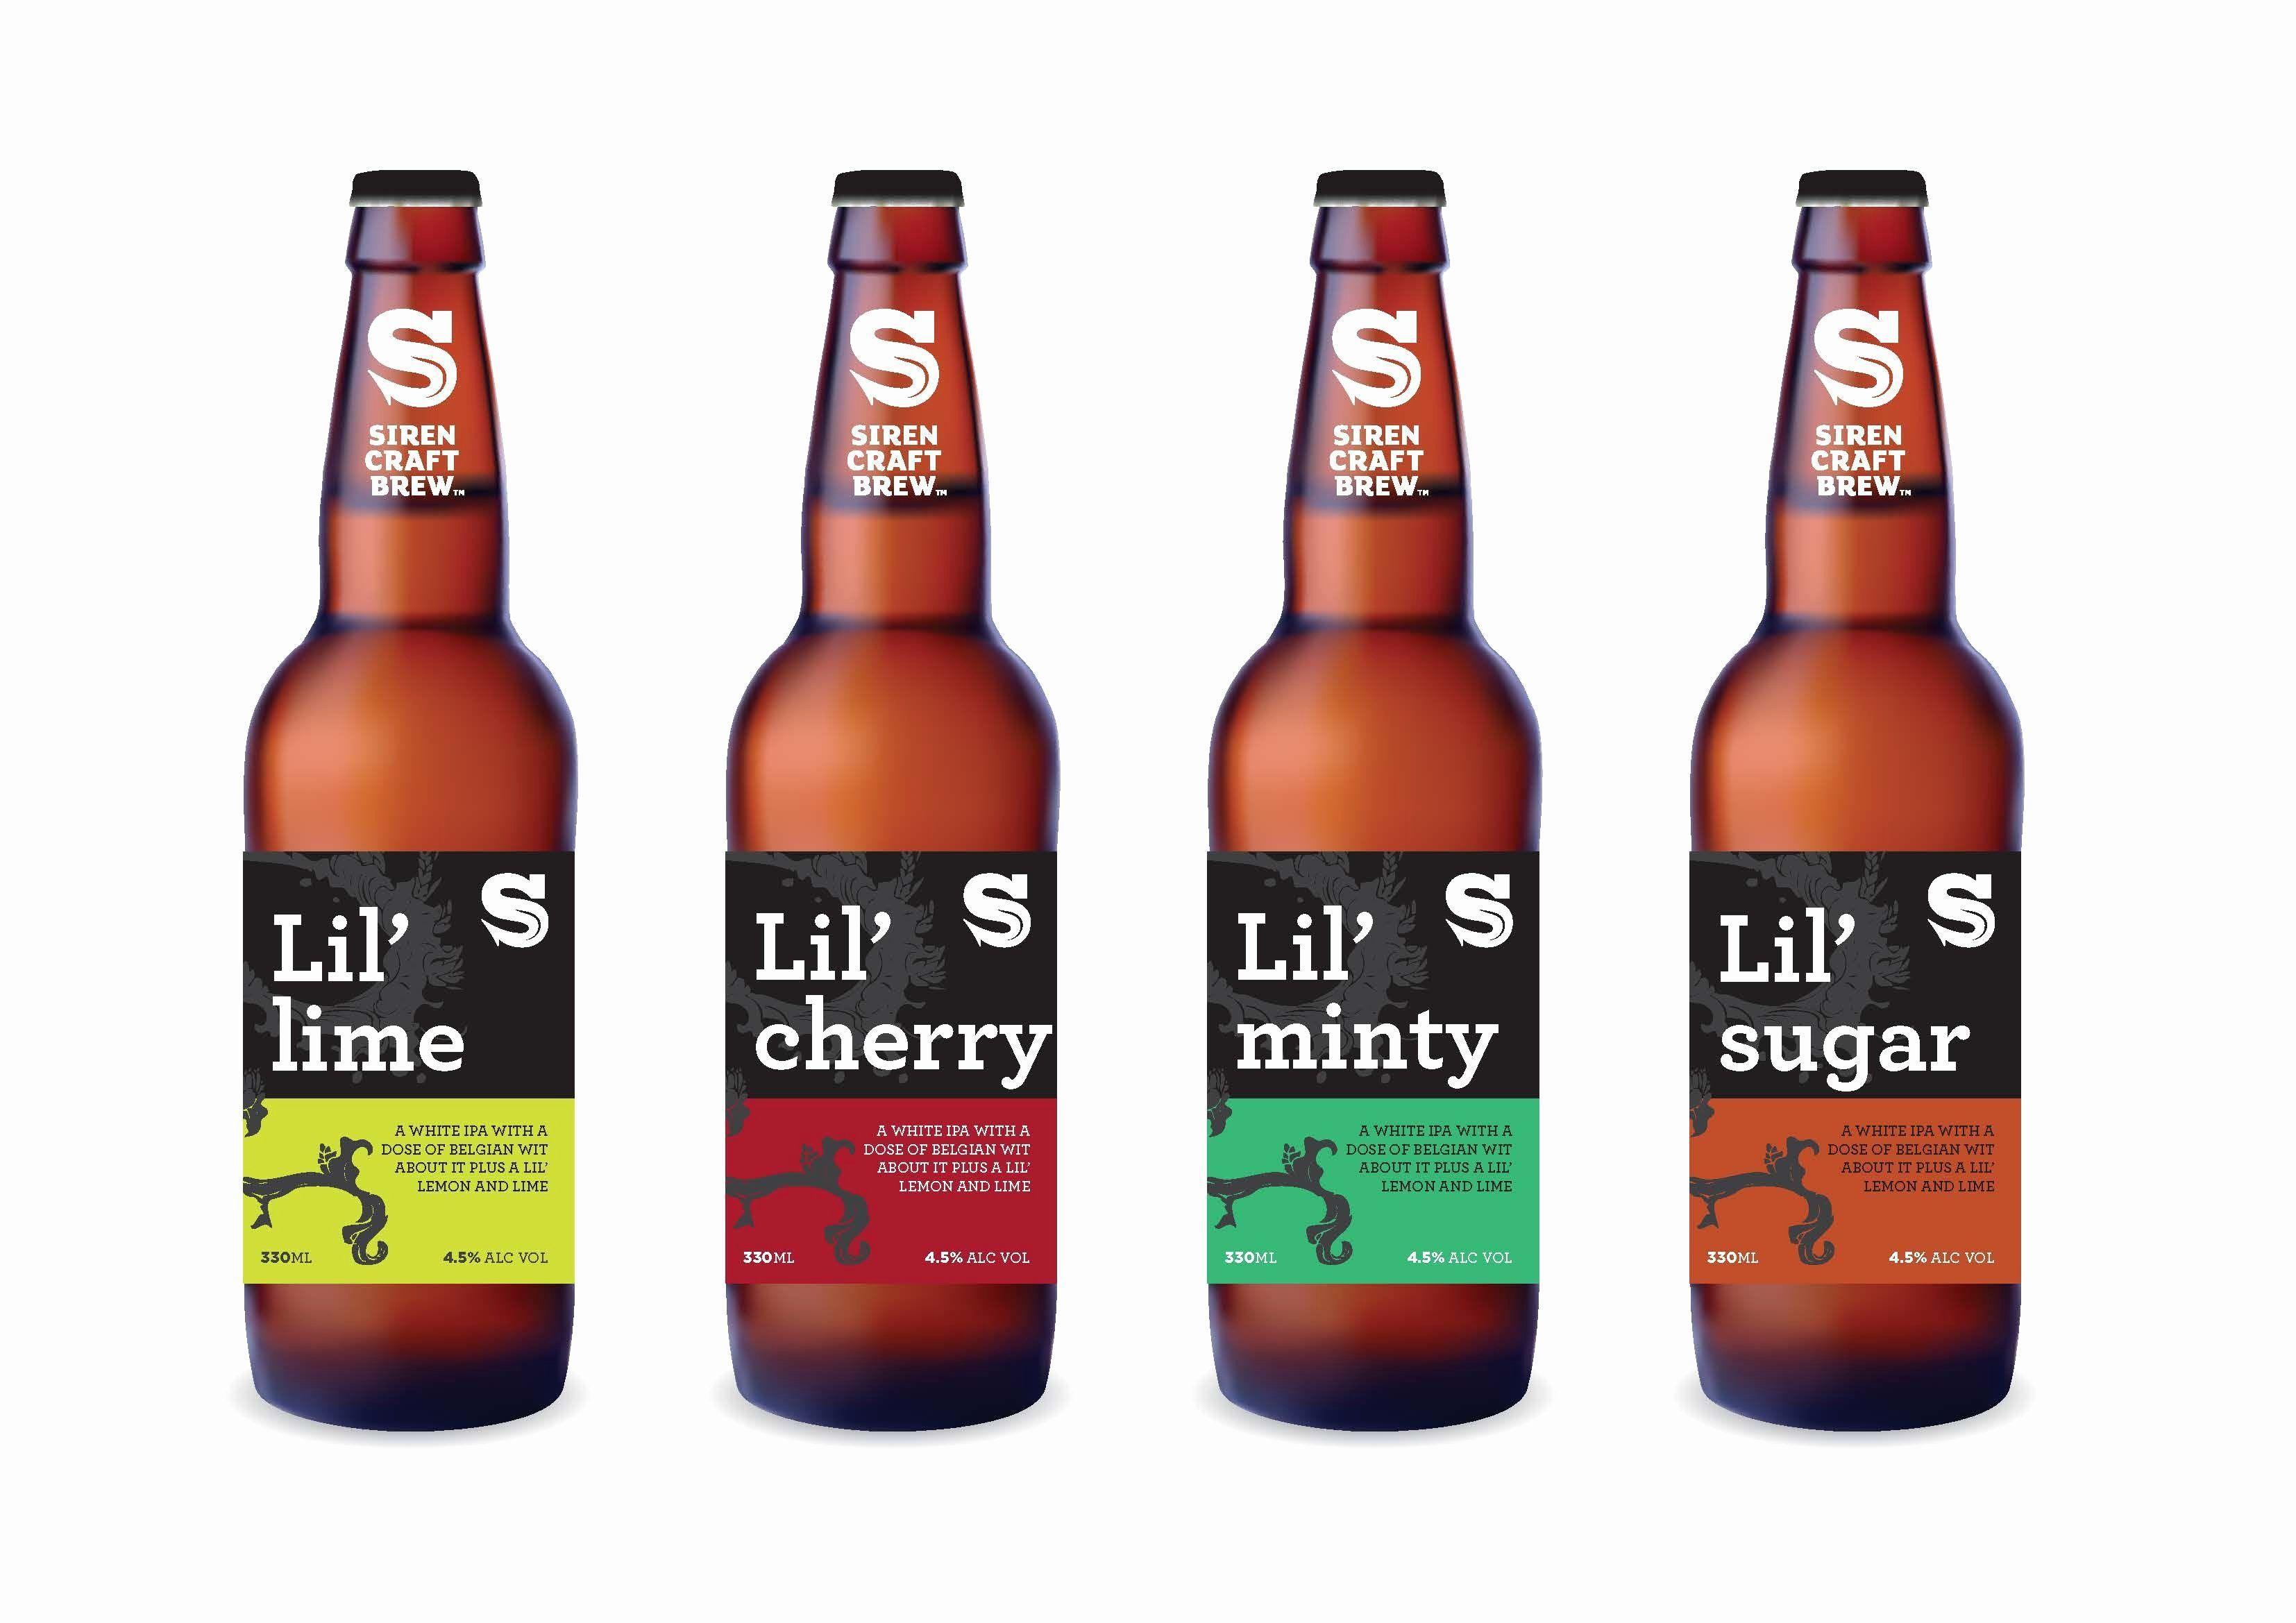 000 Stunning Beer Bottle Label Template Word High Resolution  FreeFull